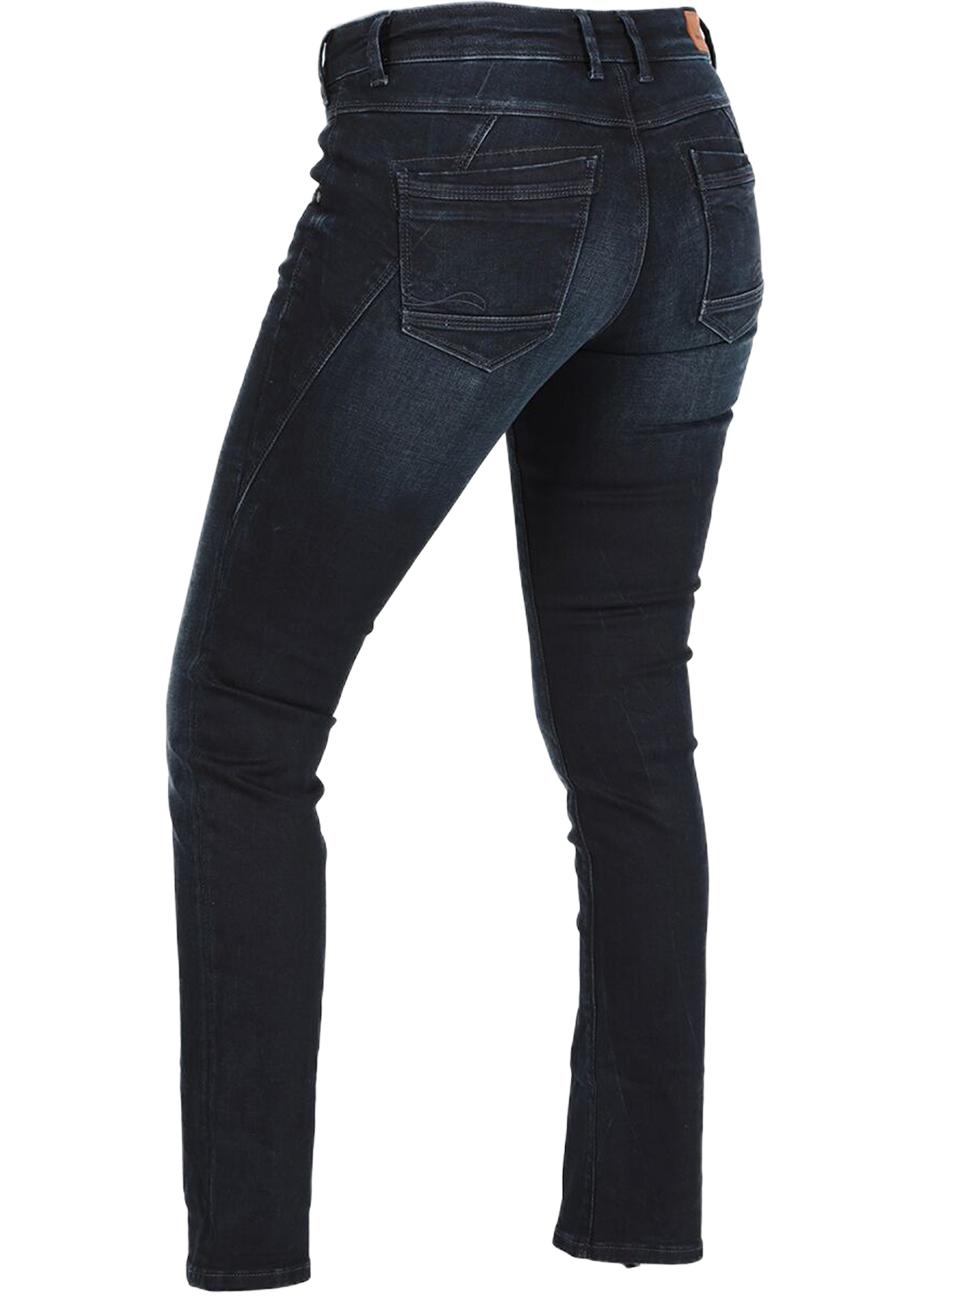 MOD Damen Jeans Rea Regular Fit Blau Elegant Blue